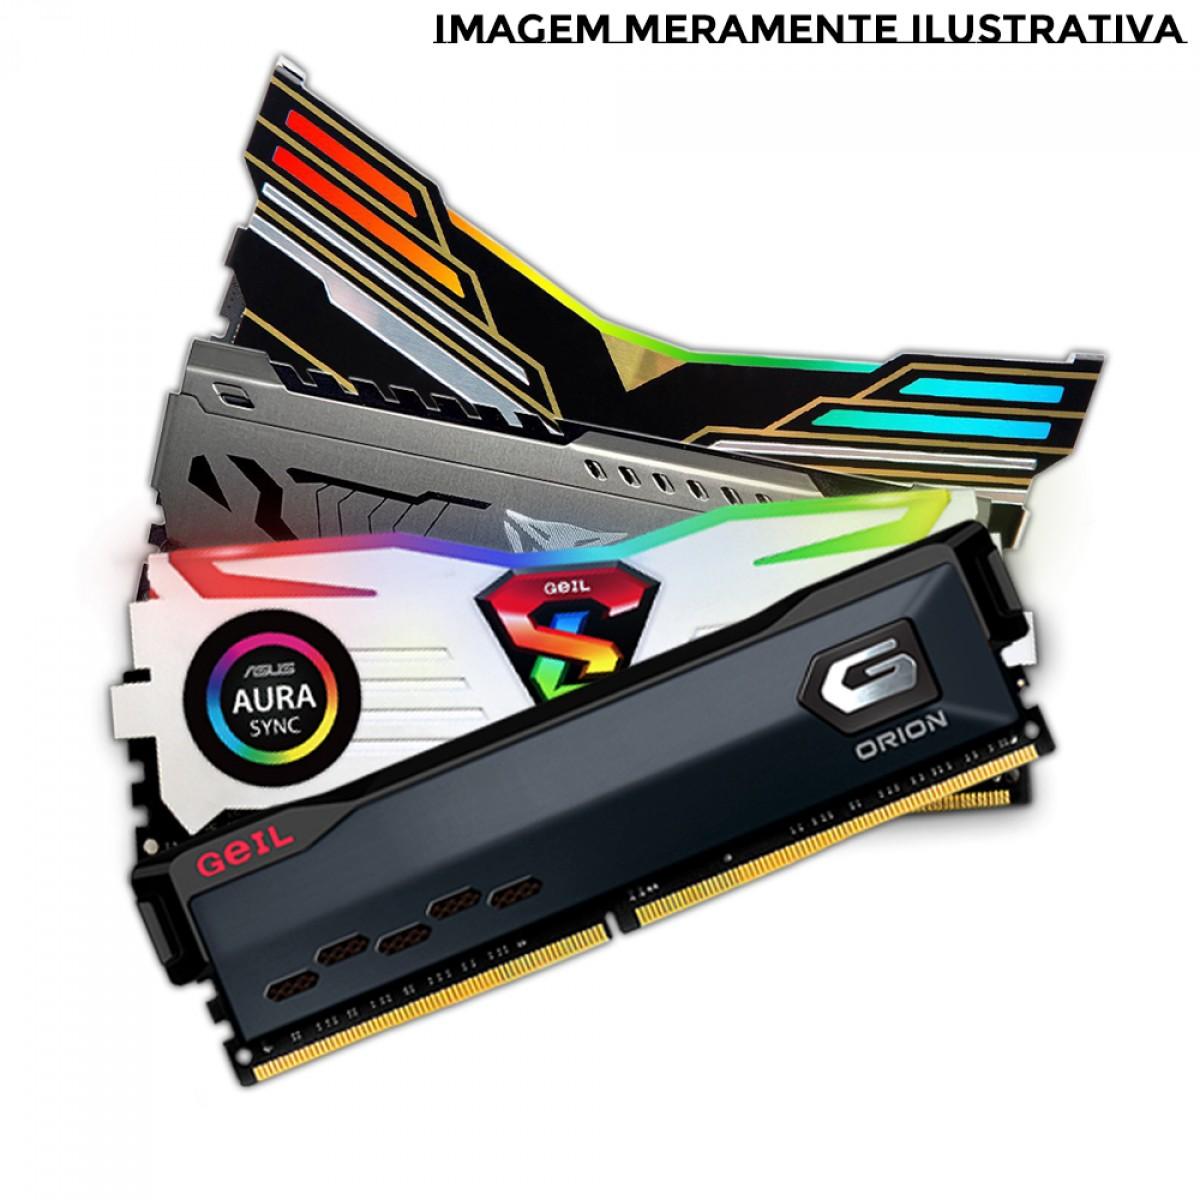 Kit Upgrade, Asus TUF B360M-Plus Gaming/BR + Intel Core I3 9100F + 16GB DDR4 3000MHz